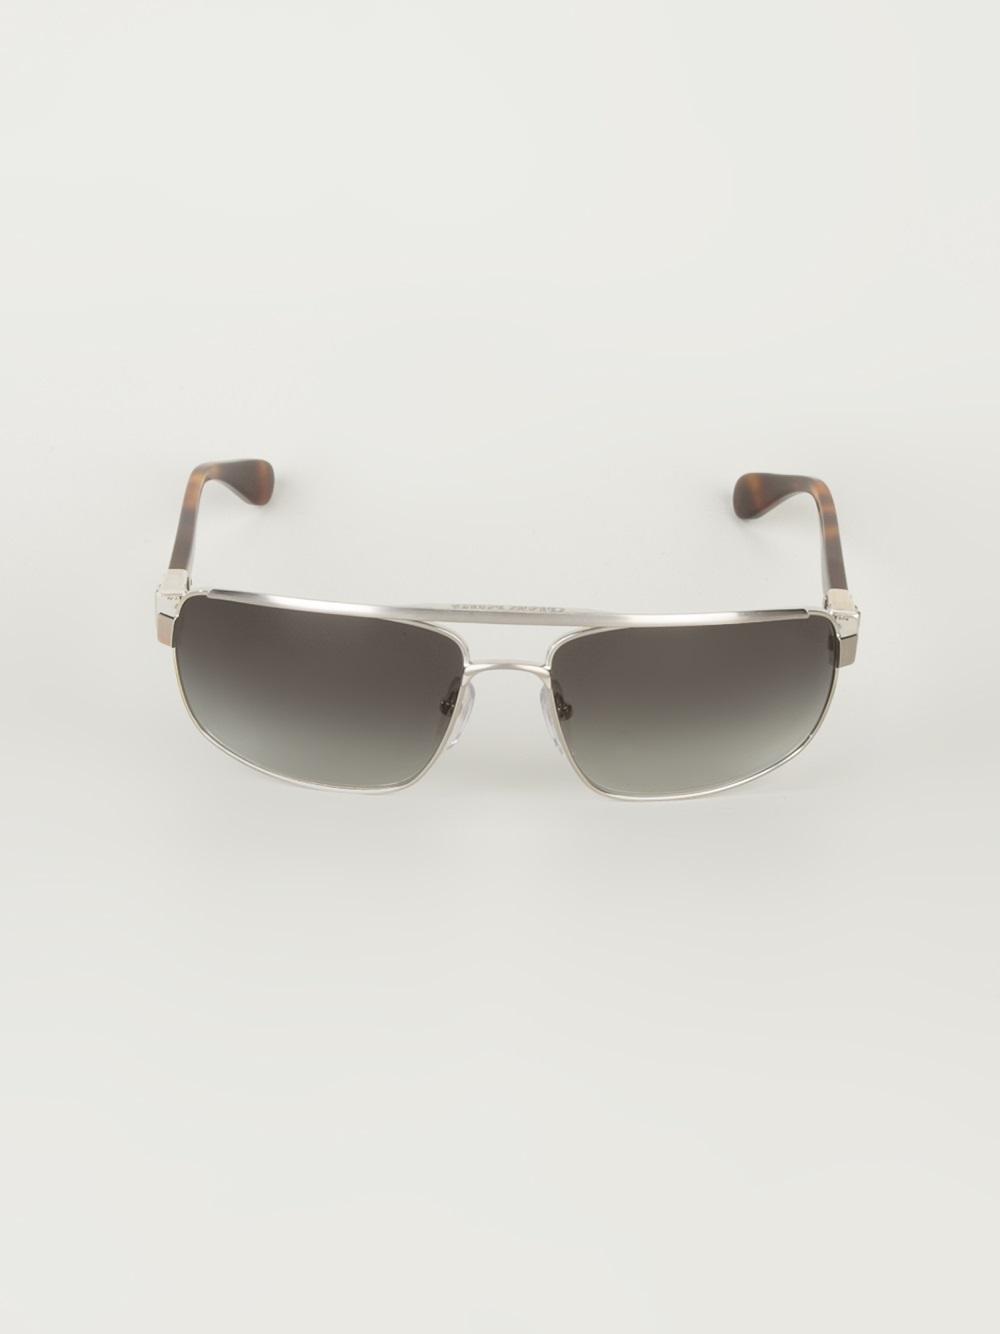 111823b31c19 Lyst - Chrome Hearts Penetration Sunglasses in Metallic for Men